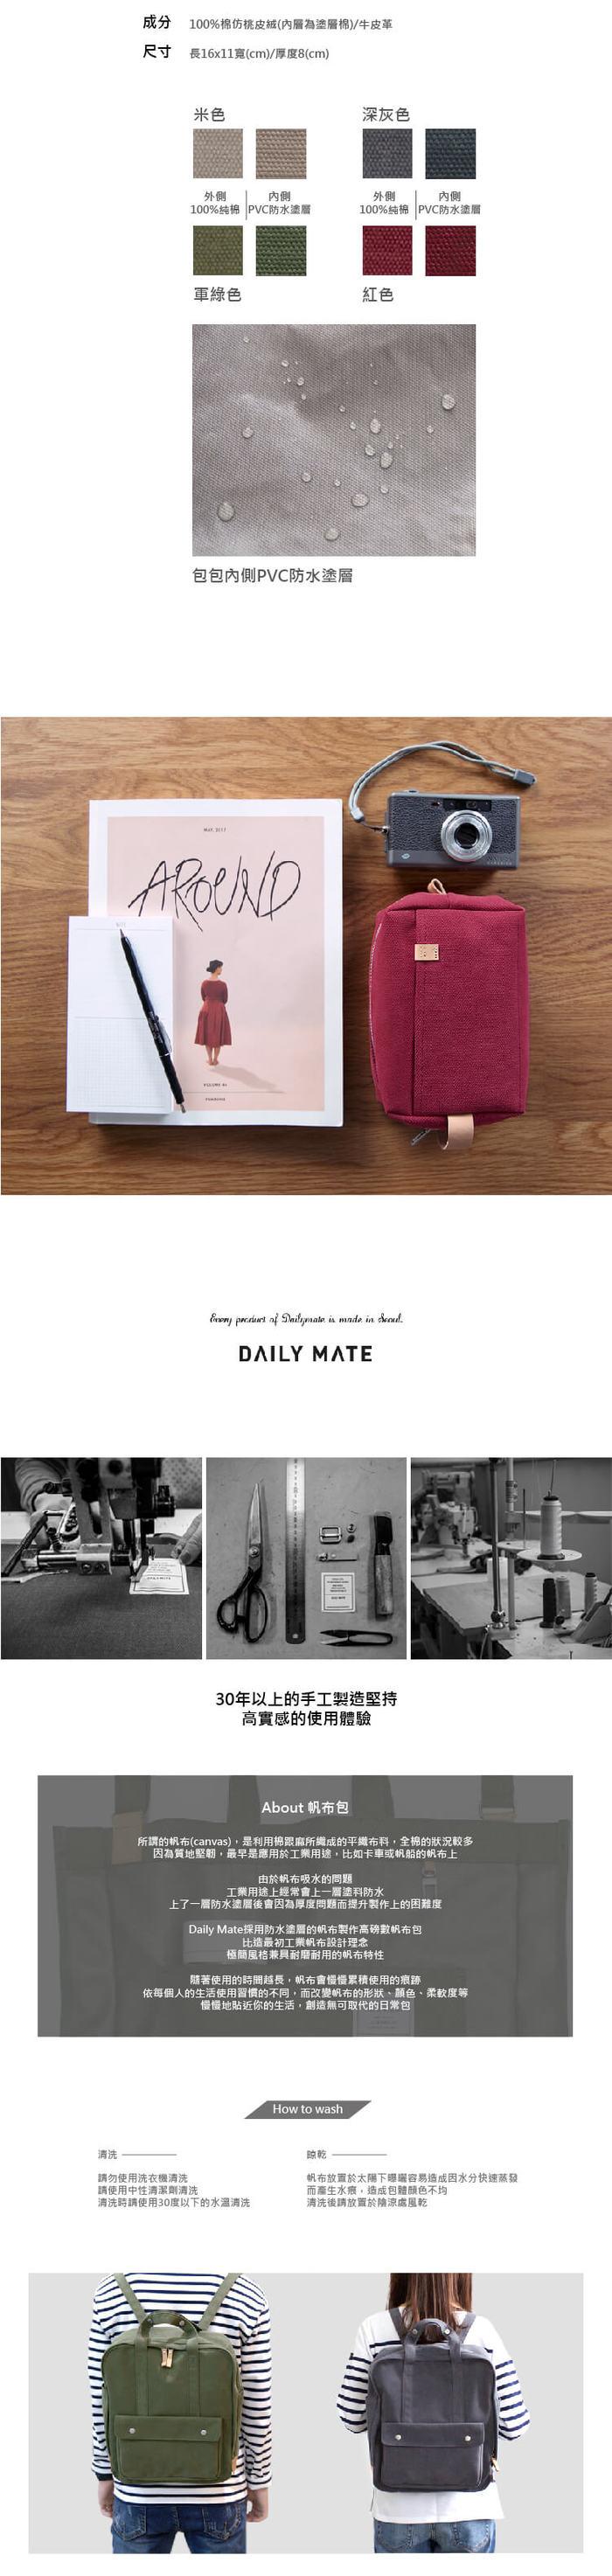 Daily mate 萬用化妝包(米色)